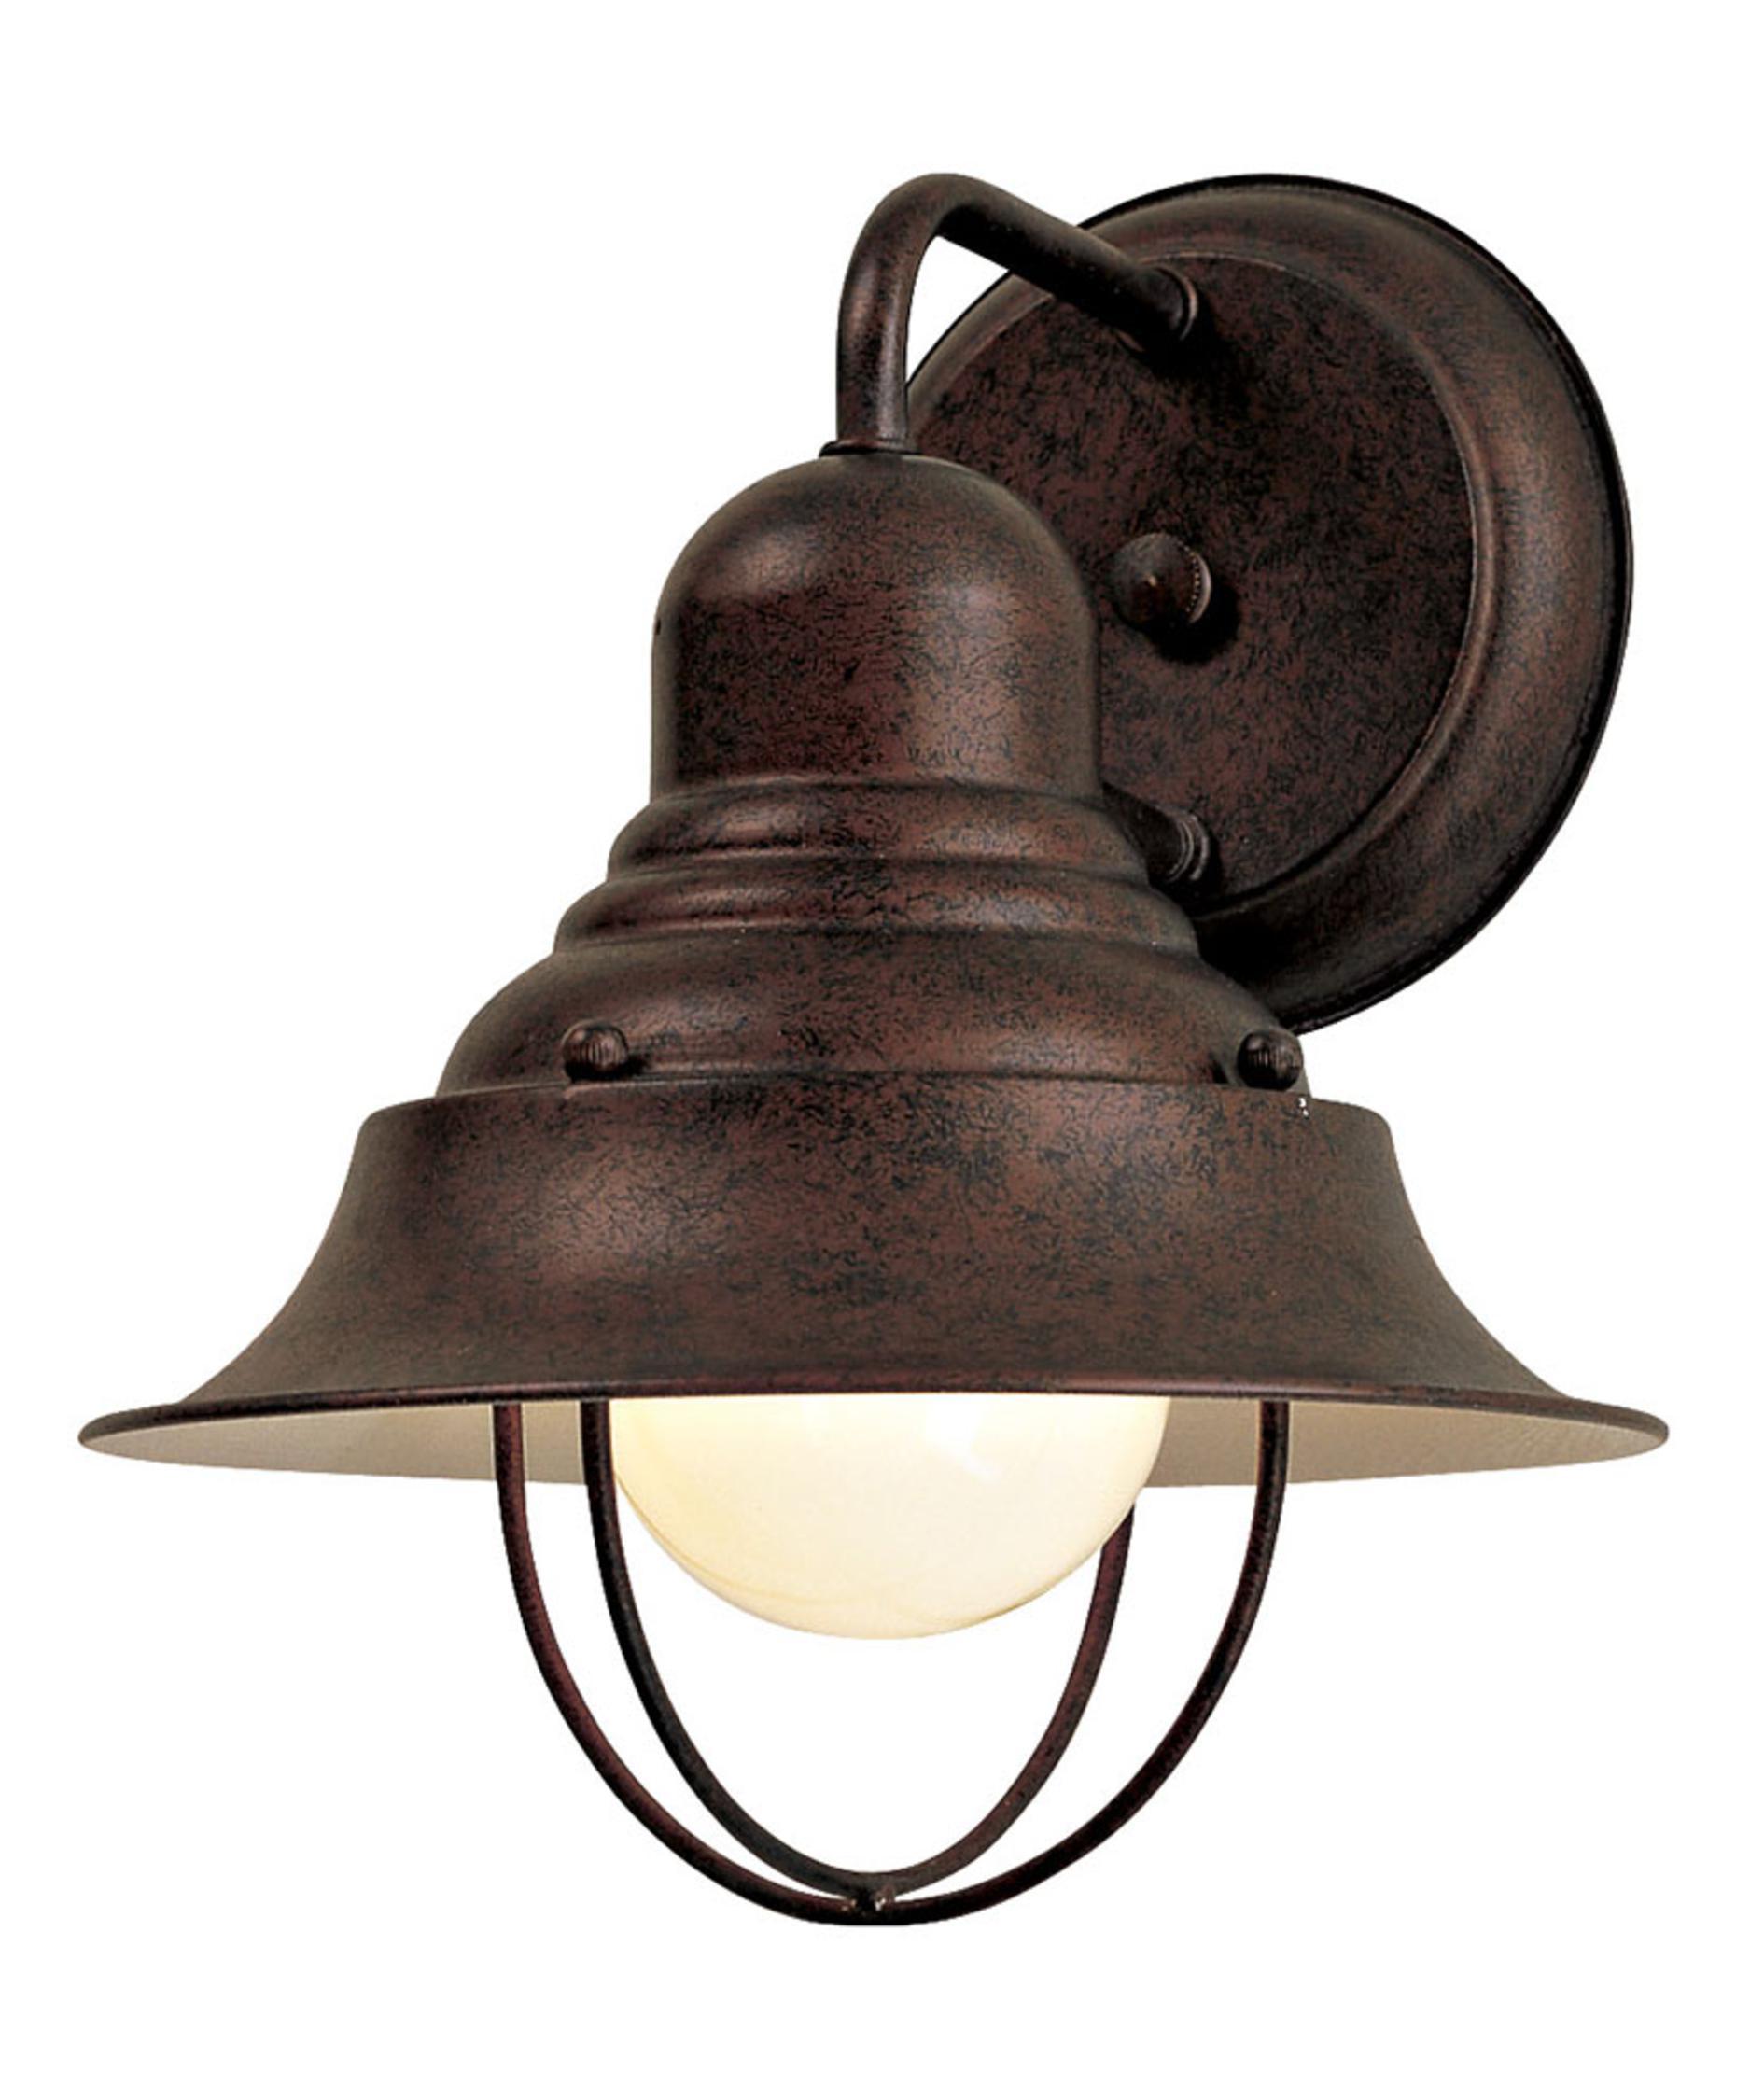 Minka Lavery 71167 Wyndmere 8 Inch Wide 1 Light Outdoor Wall Light |  Capitol Lighting 1 800lighting.com